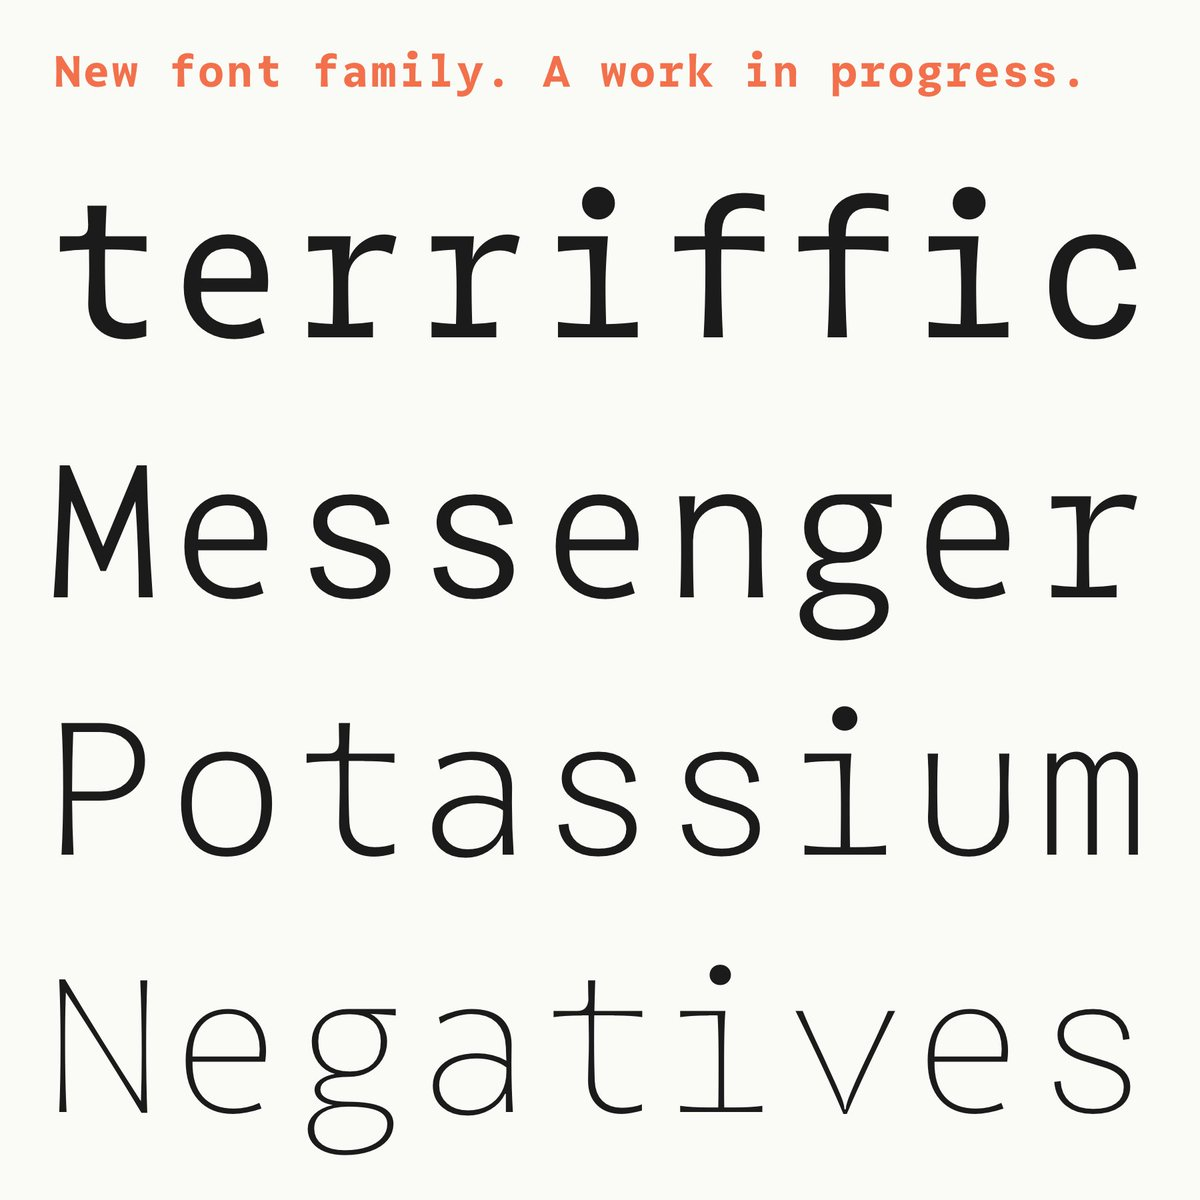 Work in progress… #type #typedesign #typeface #font #newfont #newfonts #typography #design https://t.co/EIHoPtHMFv